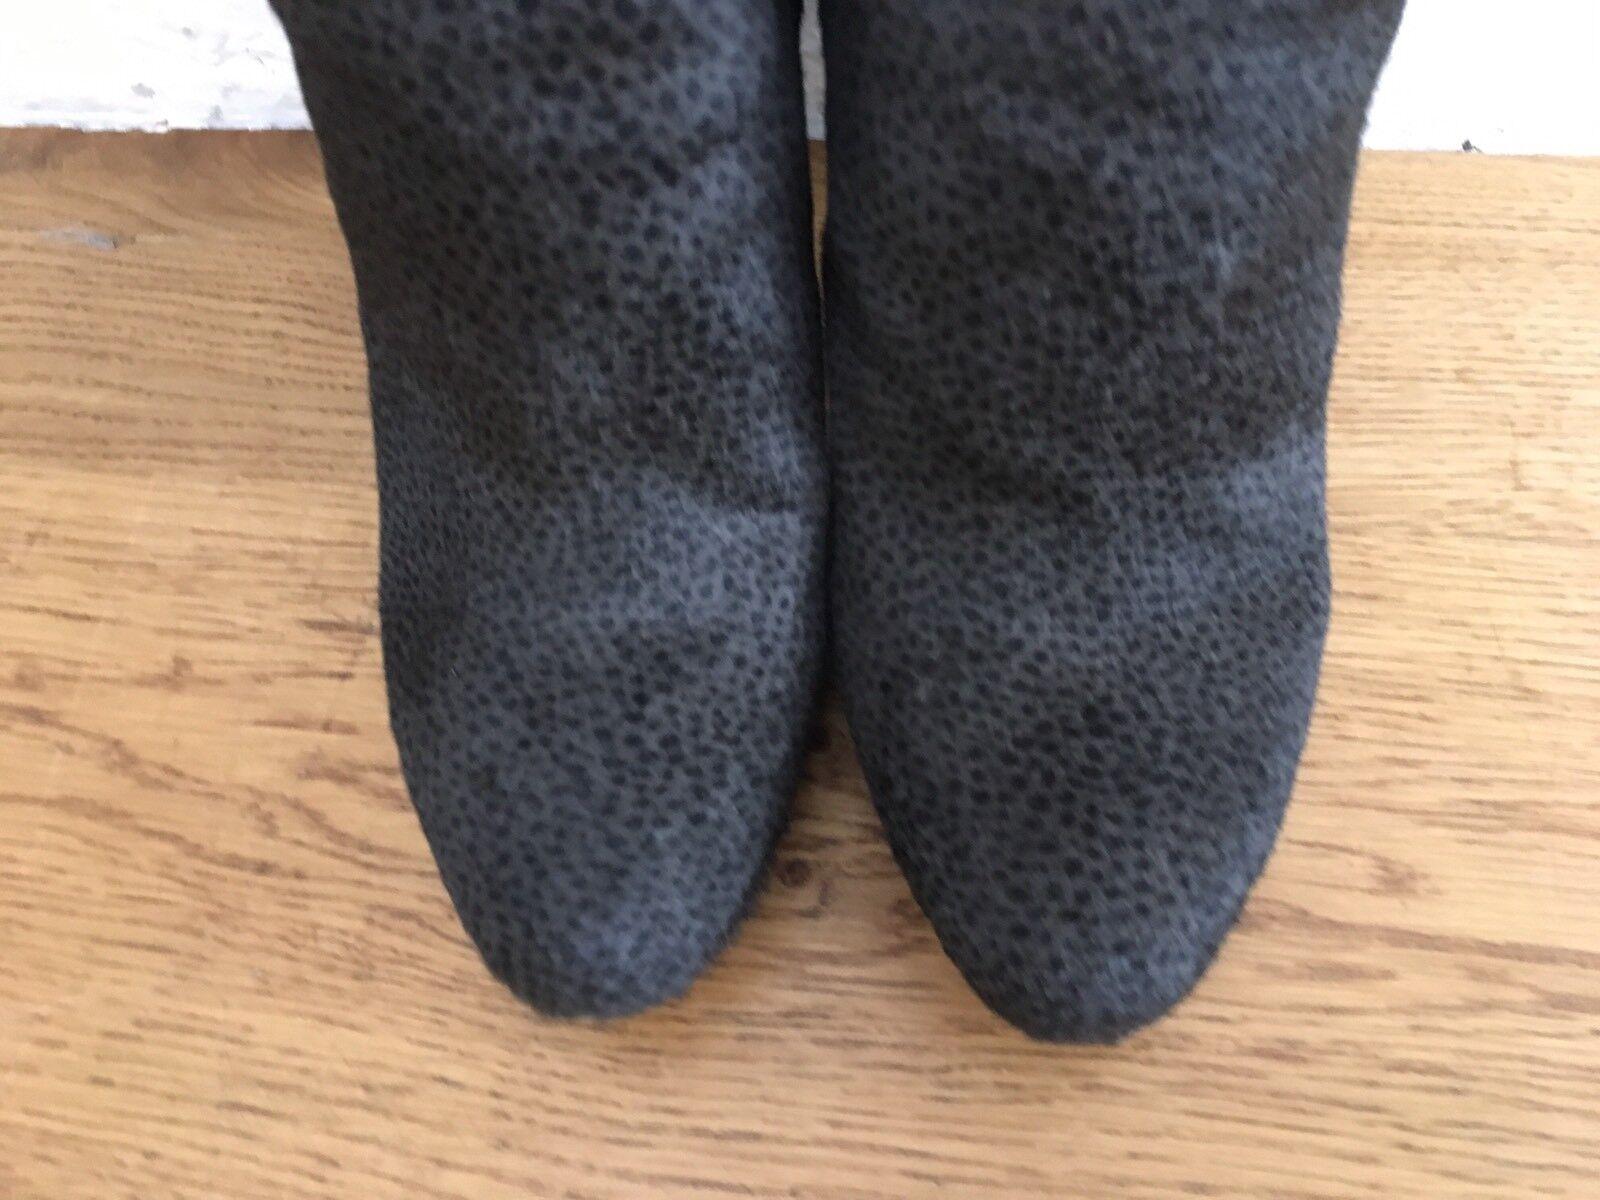 Prada Calf Hair Ankle Booties Short High Heel Boots $1250 Sz Sz $1250 39.5 US 9.5 744079